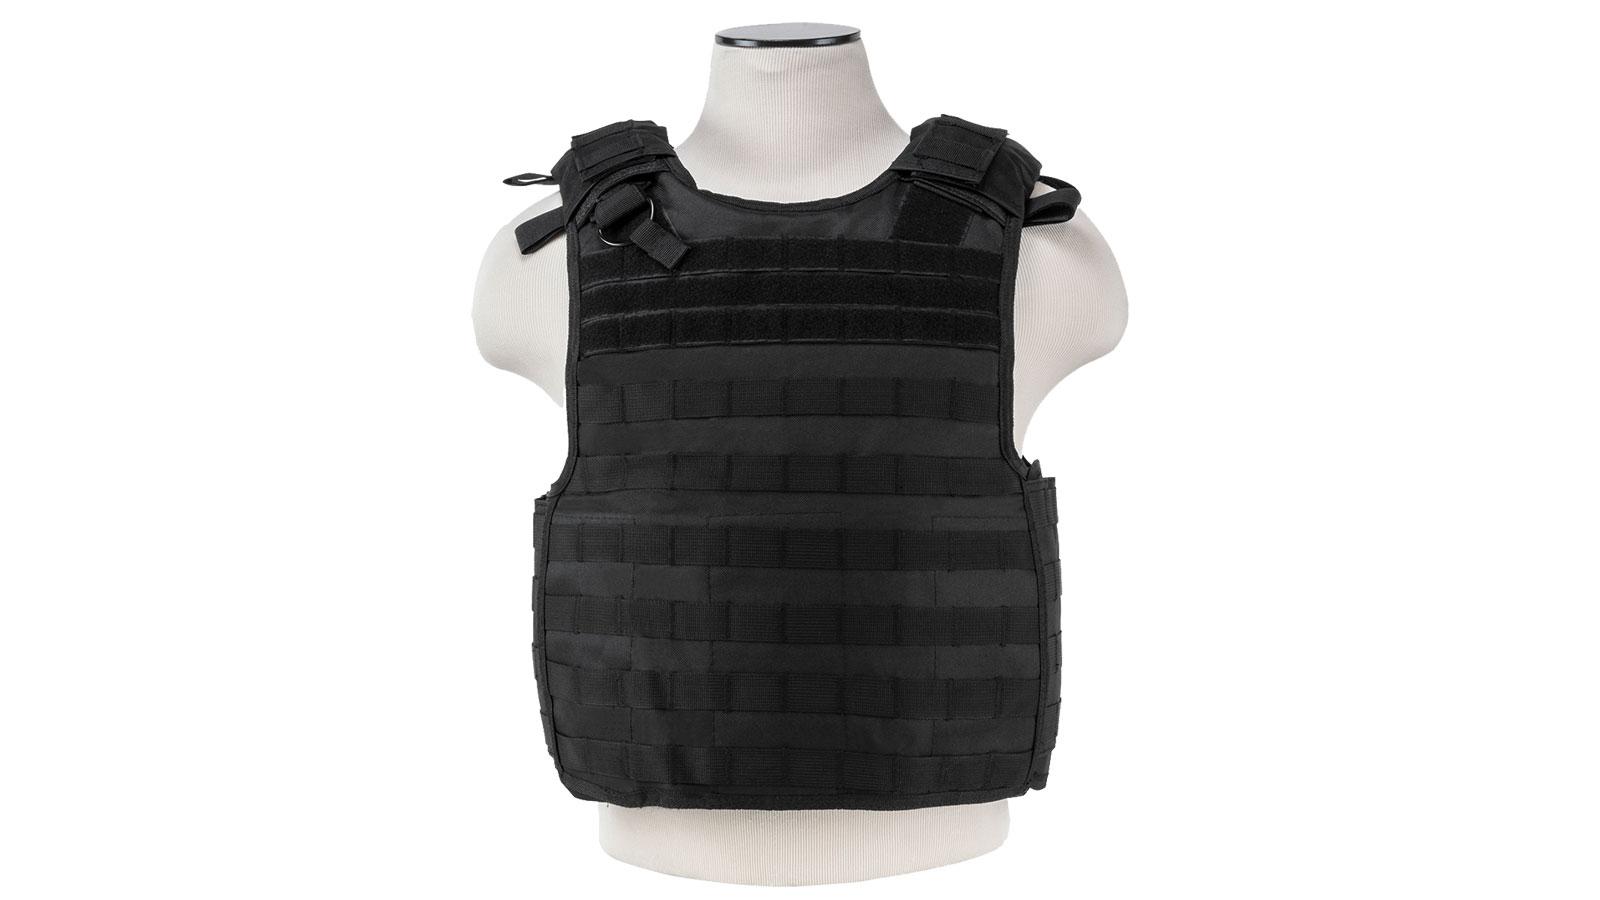 NC Star Quick Release Plate Carrier Vest Black